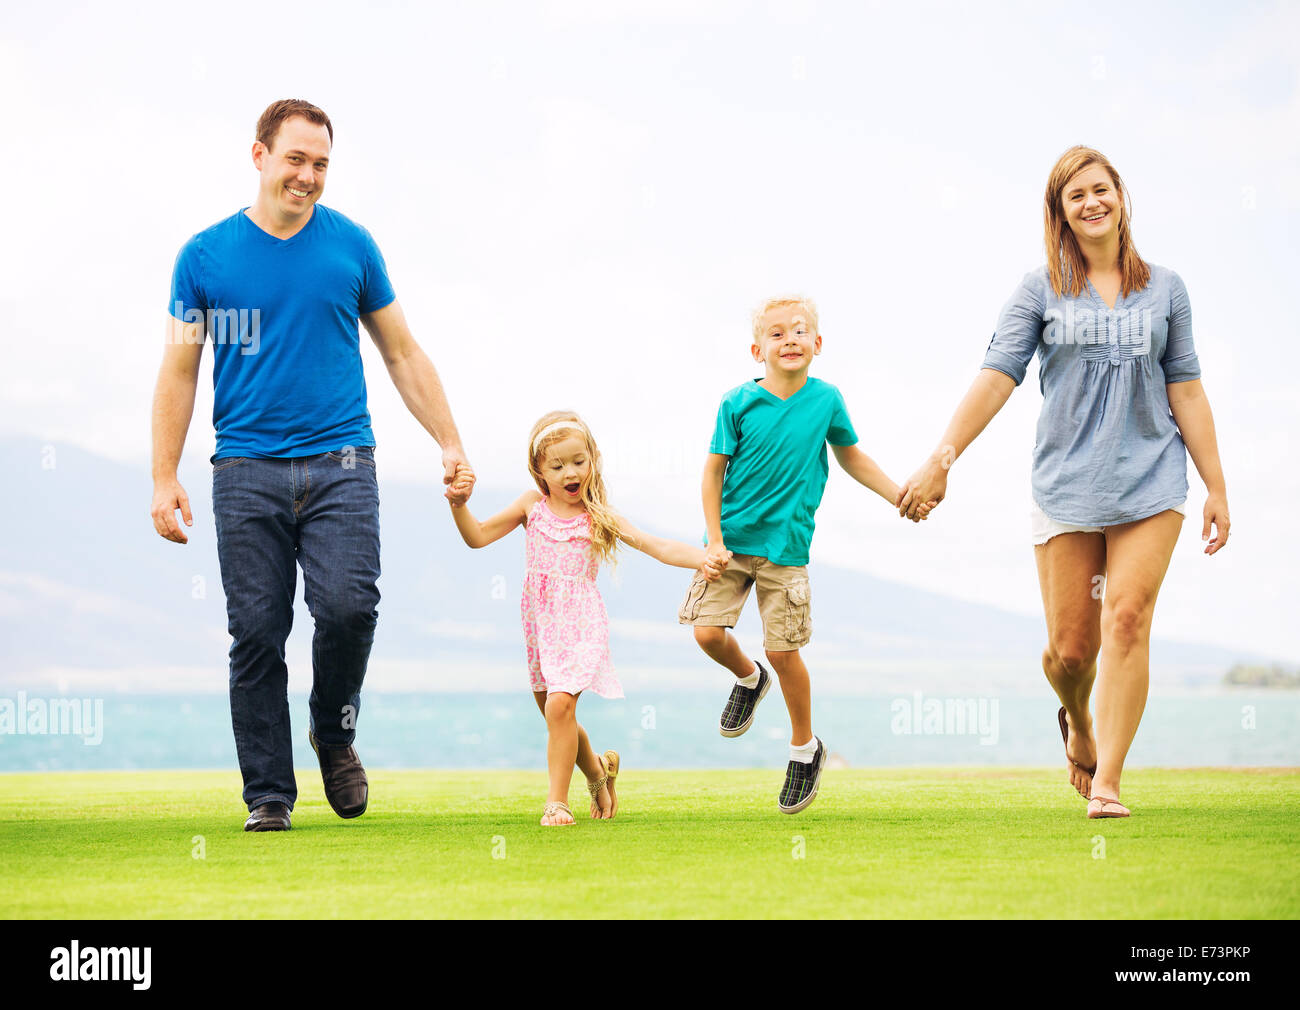 Familia Feliz fuera sobre el césped Imagen De Stock